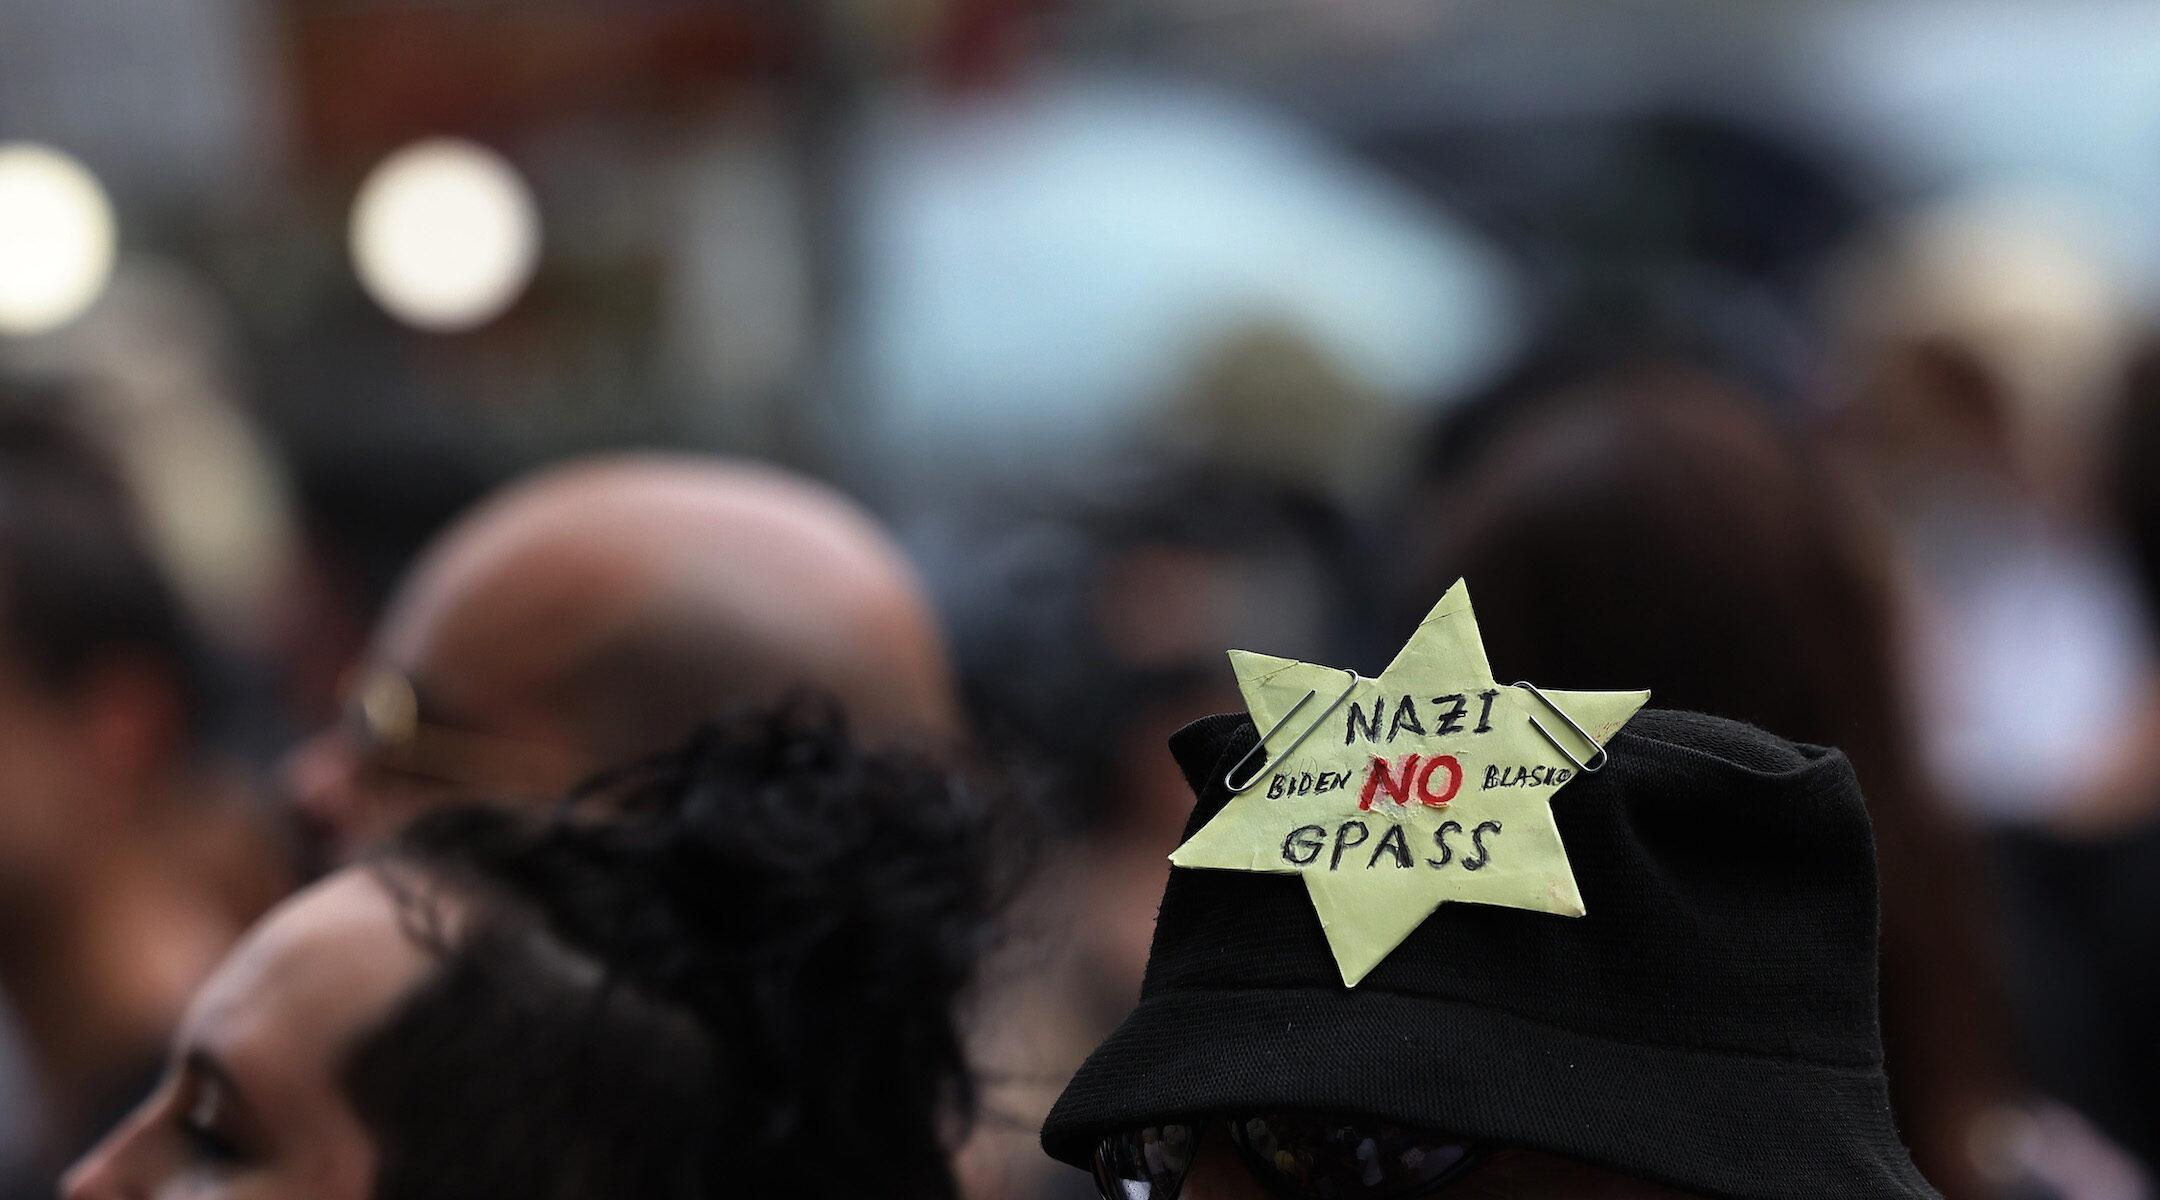 Protest Holocaust comparisons COVID